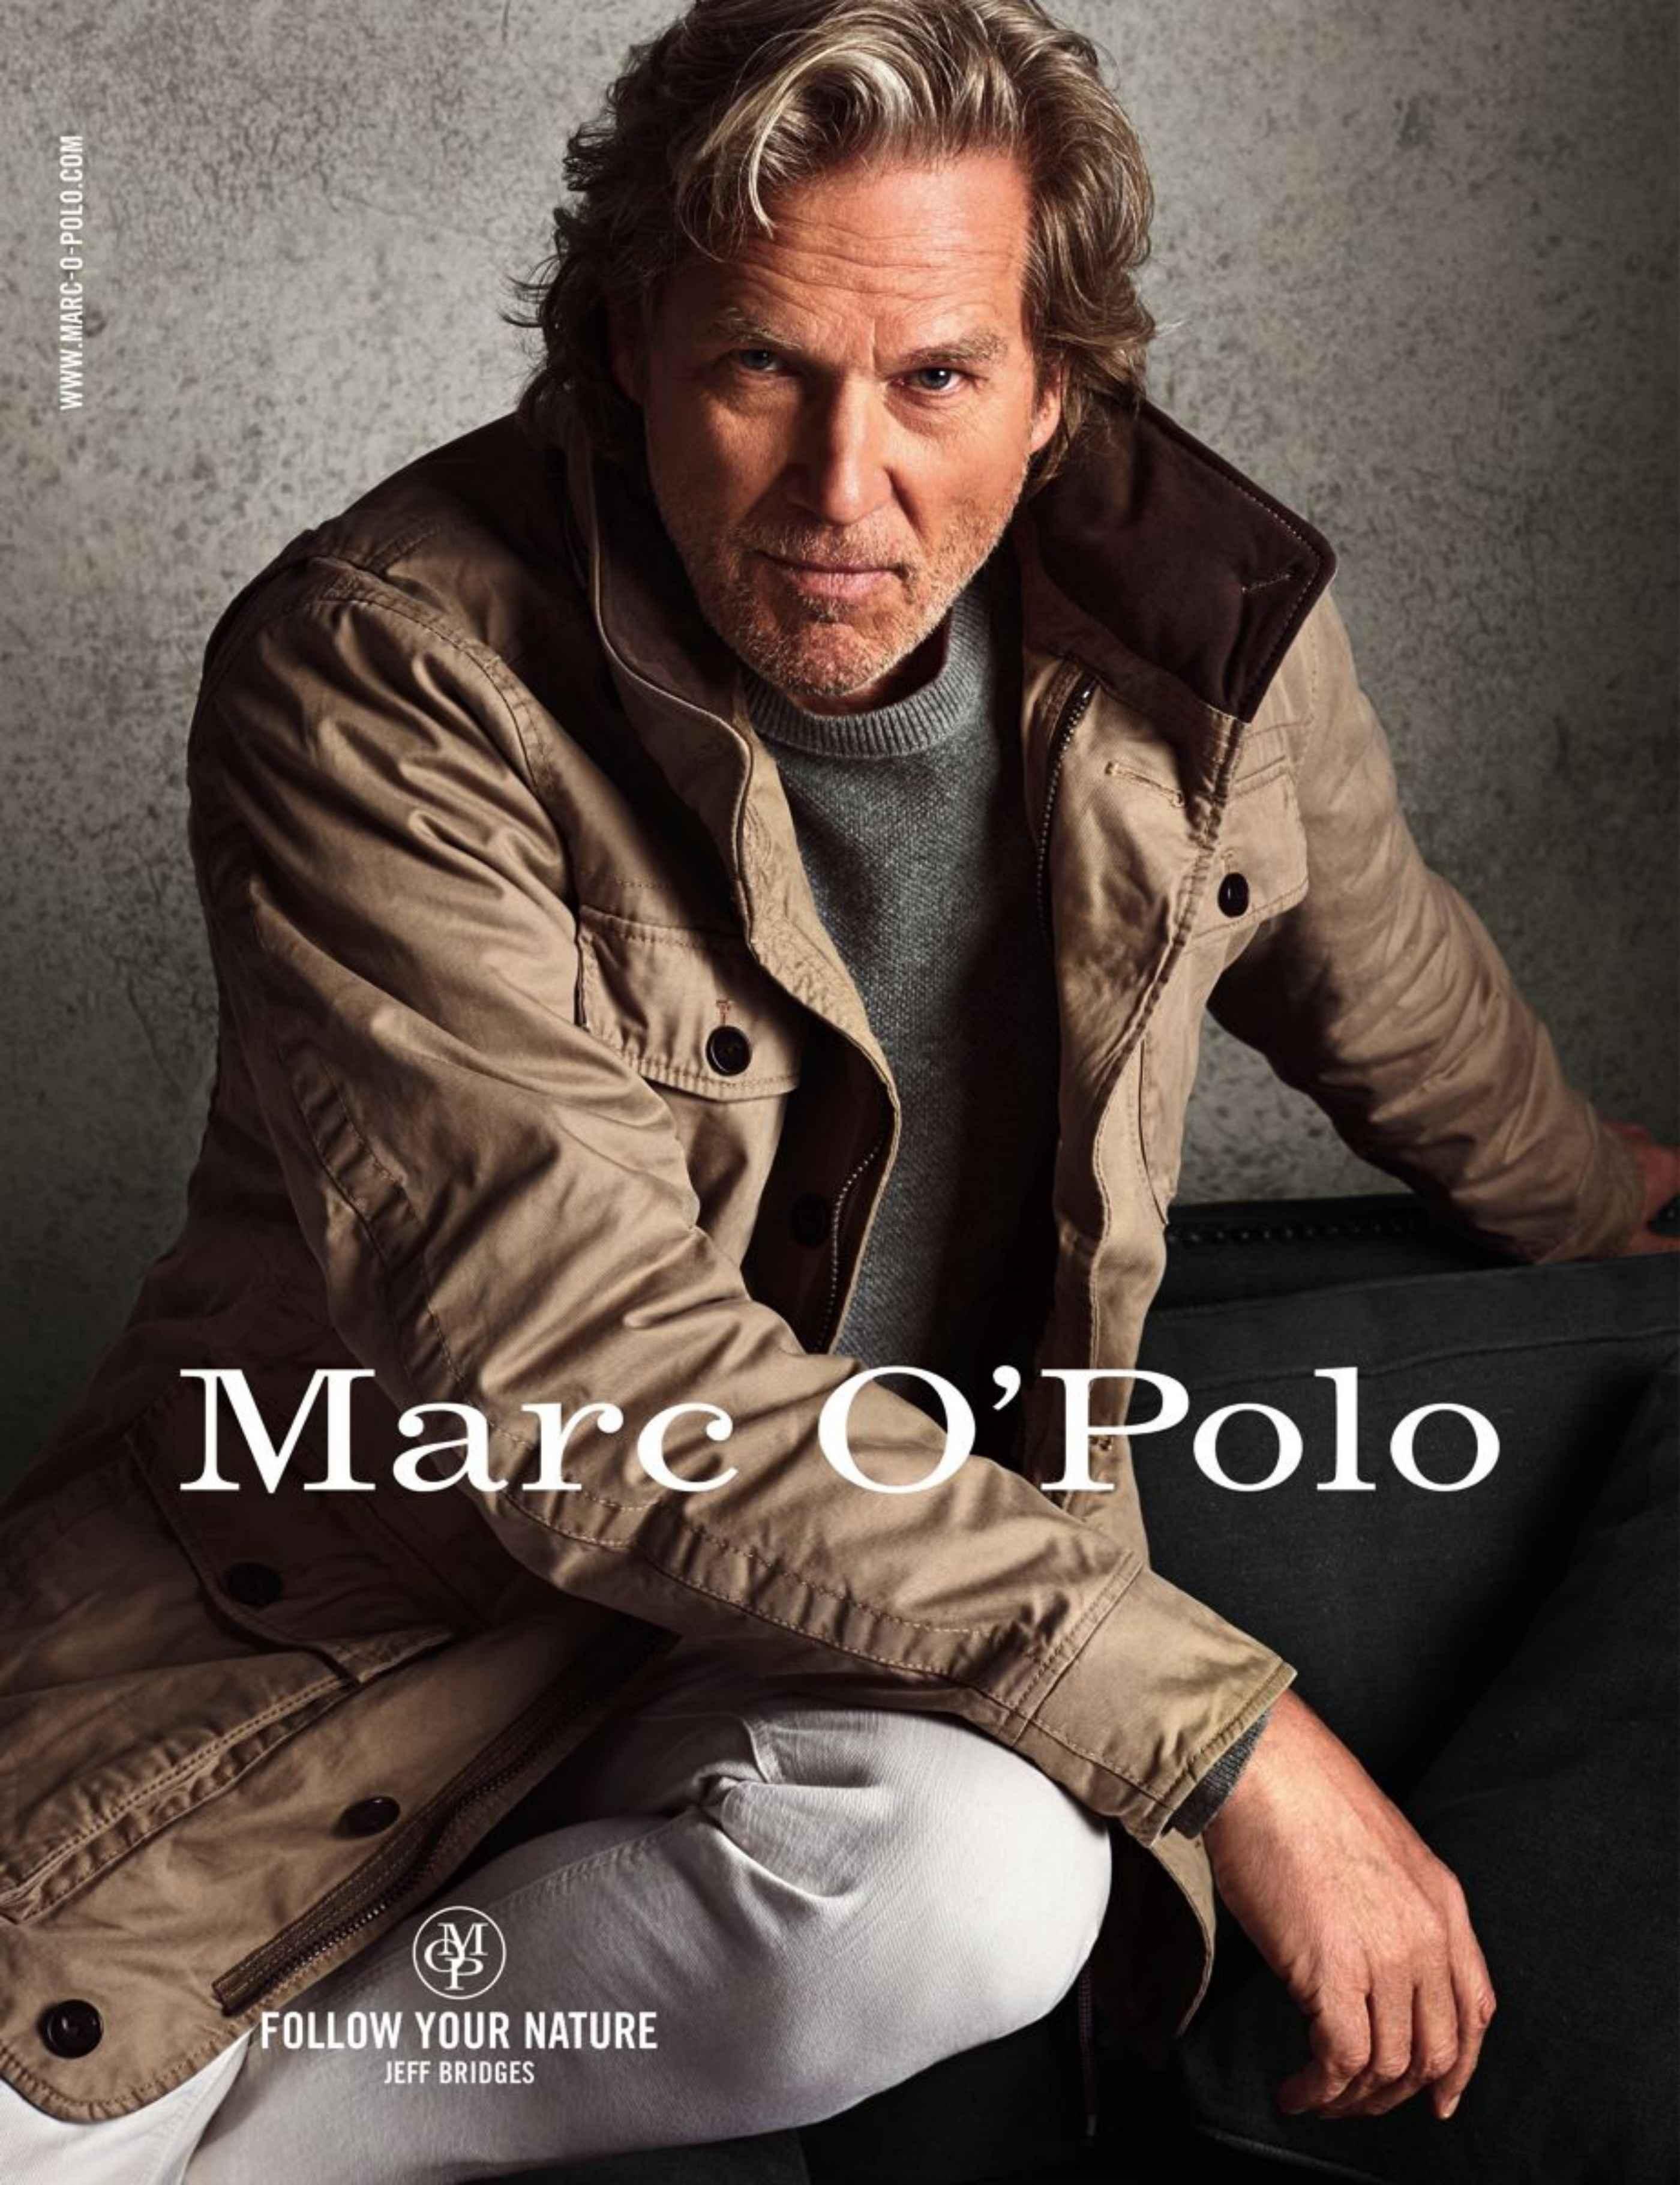 Jeff Bridges for Marc O'Polo Fall/Winter 2014 Ad Campaign